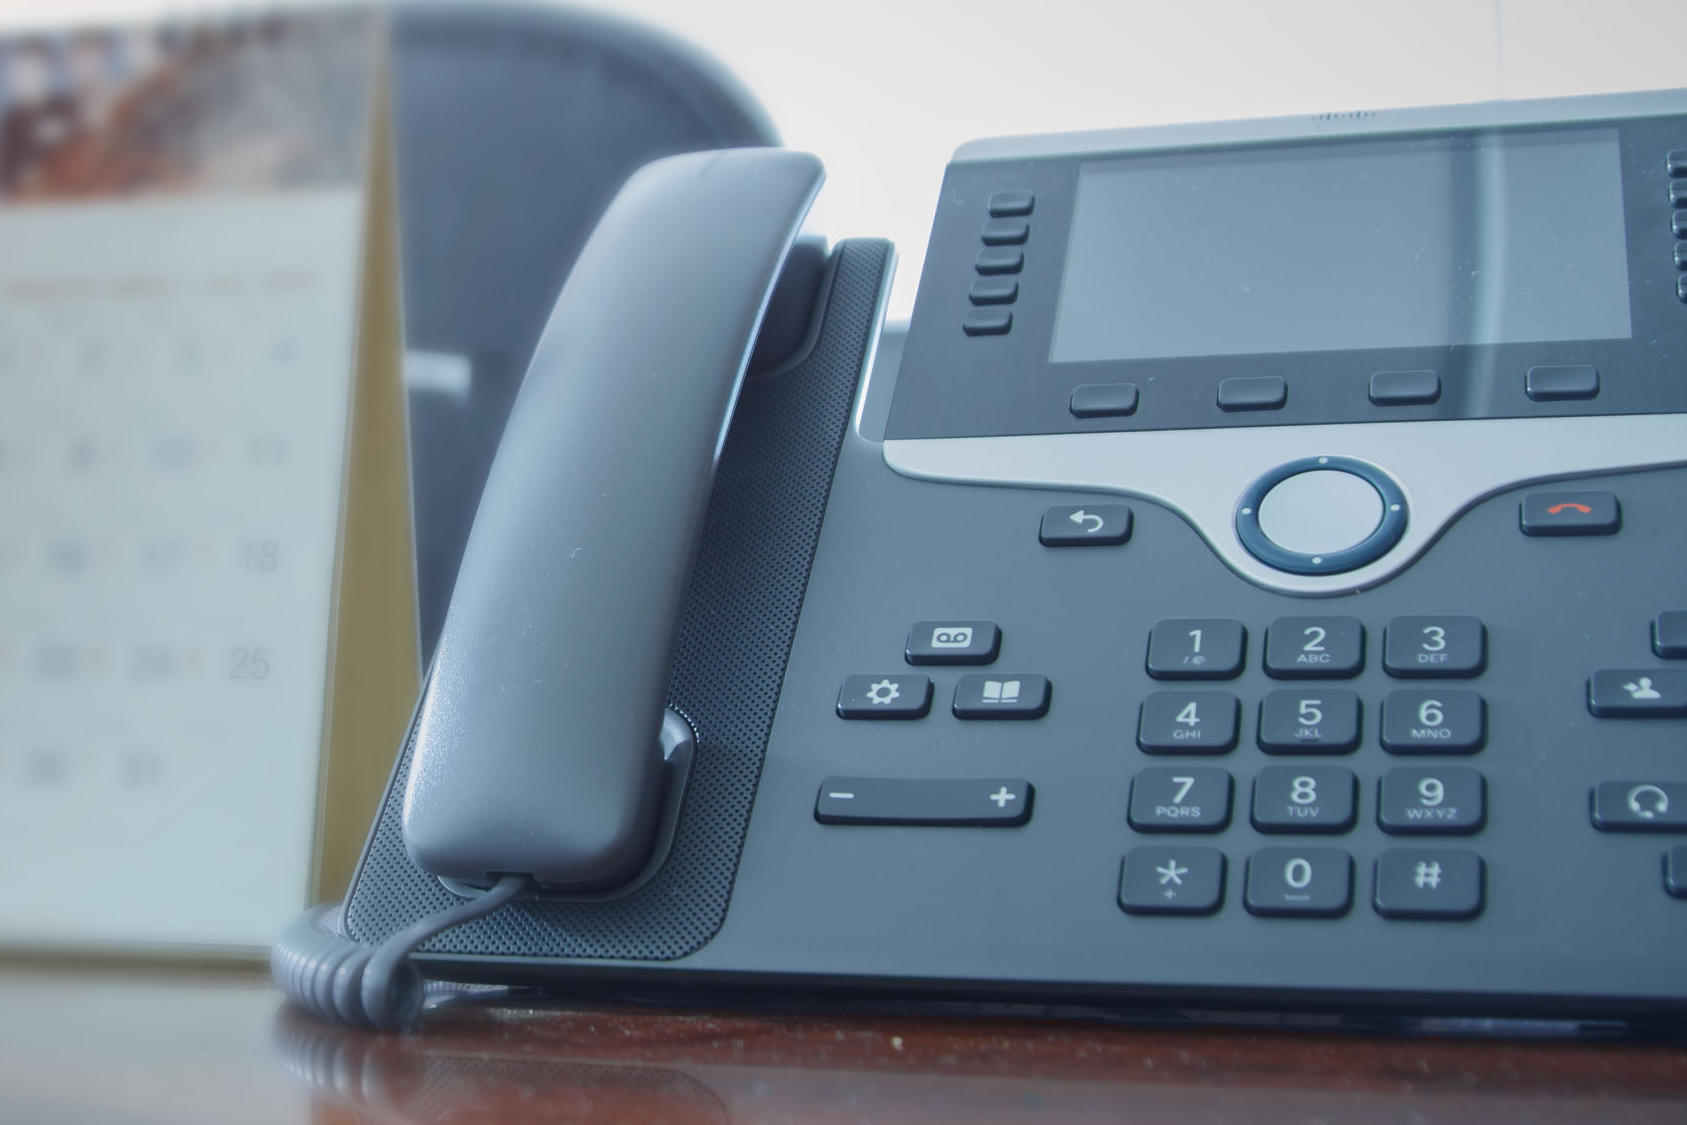 Internet from Keystone Communications